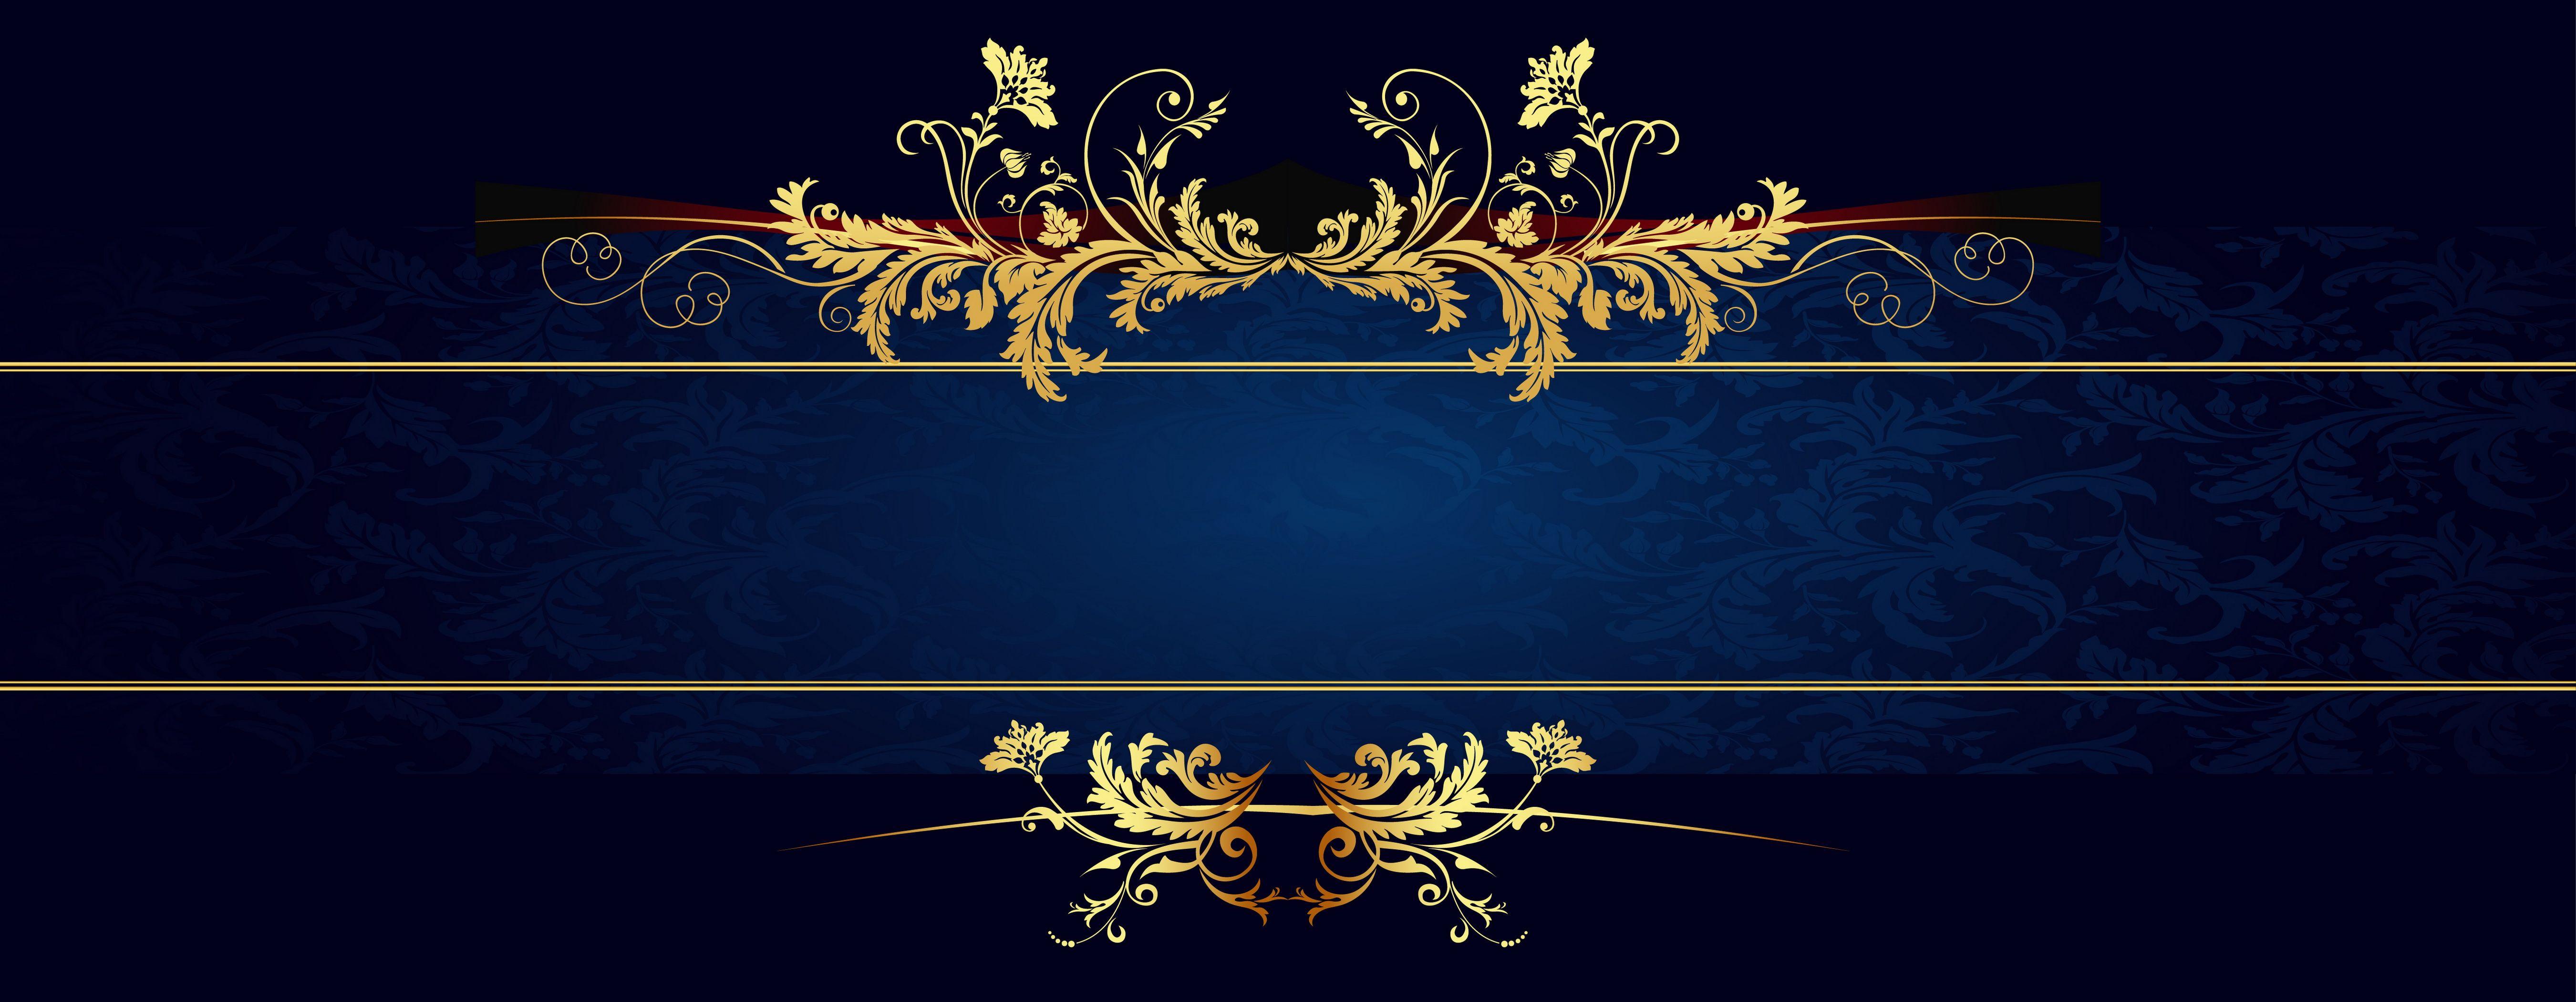 Euporean Pattern Frame Border Design Royal Frame Black Background Wallpaper